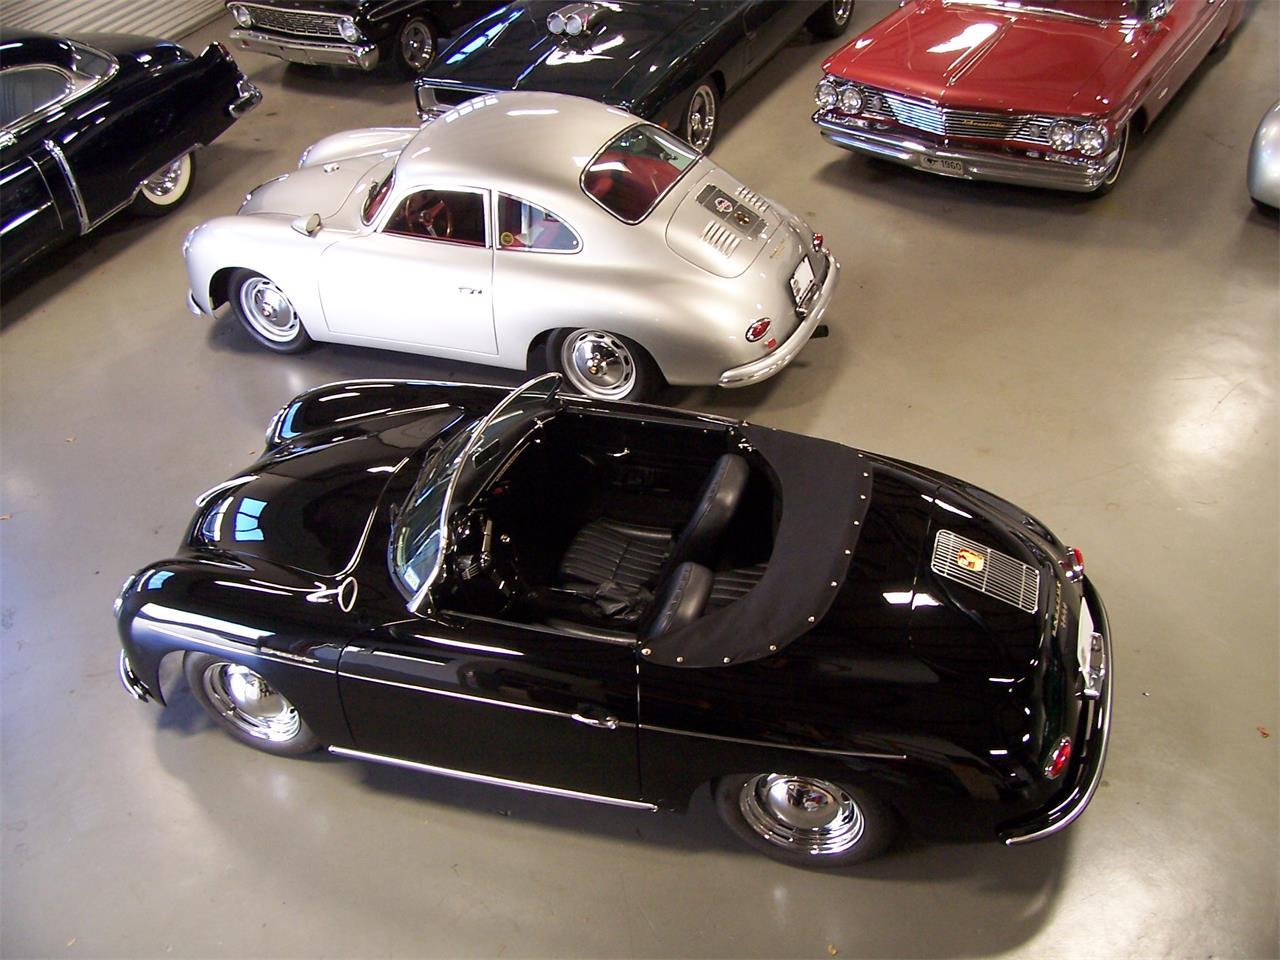 1957 Porsche 356 (CC-1173257) for sale in Alpharetta, Georgia